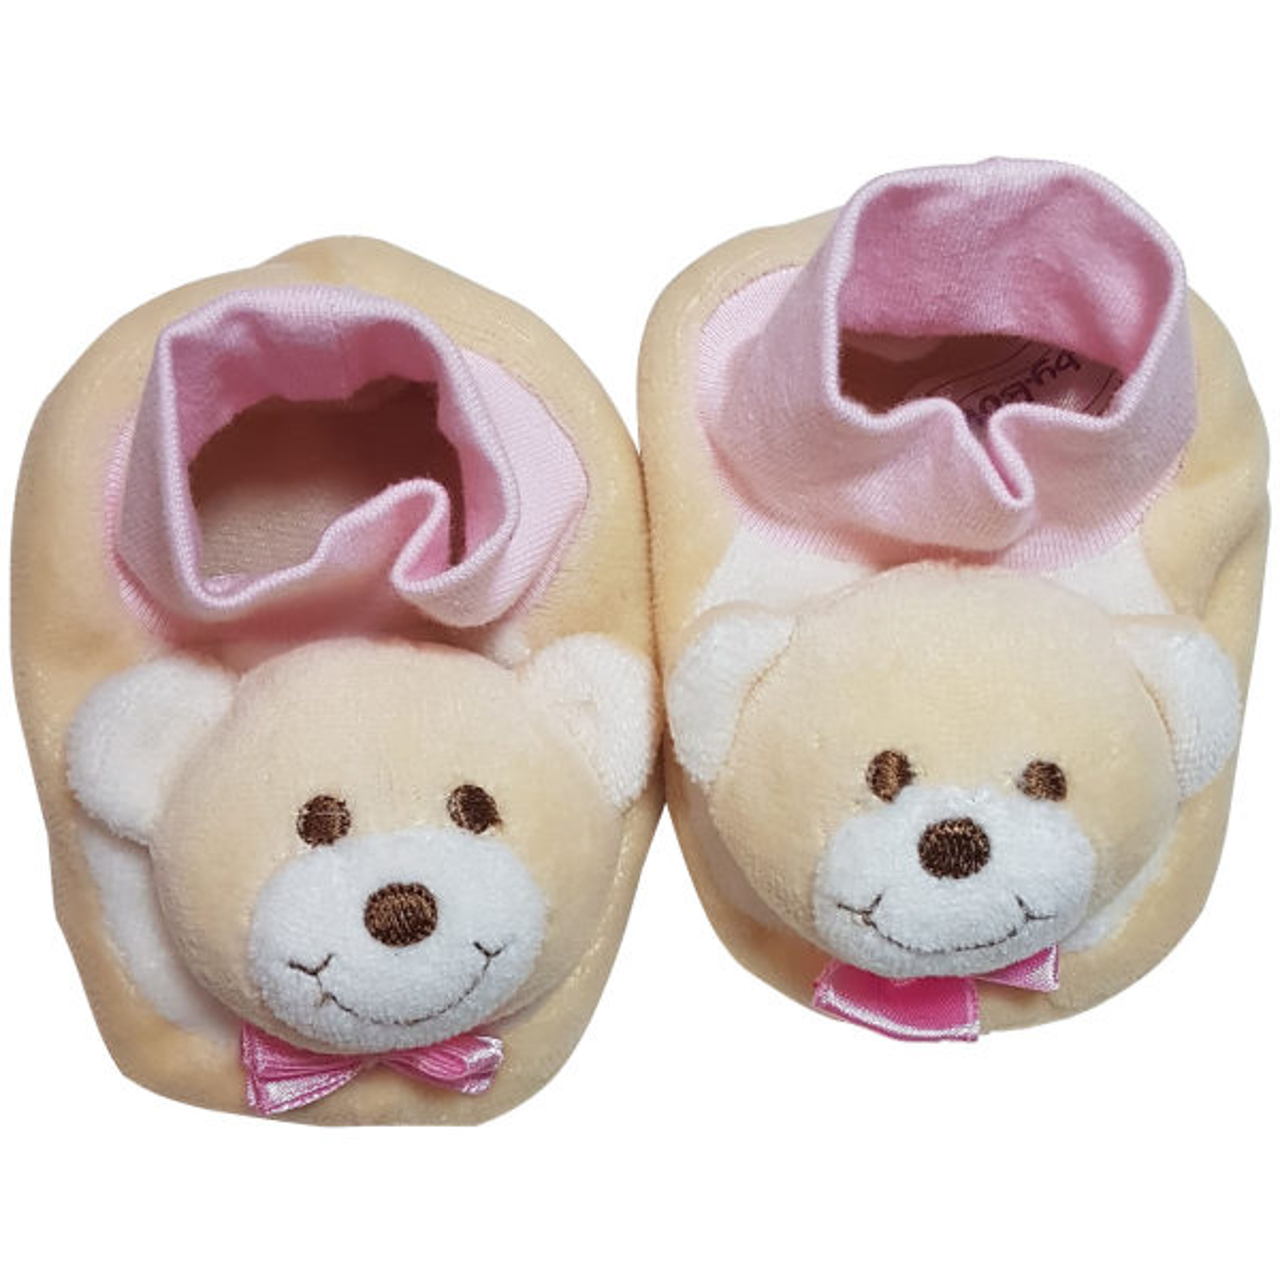 پاپوش نوزادی دخترانه بی بی بو طرح خرس مدل n146